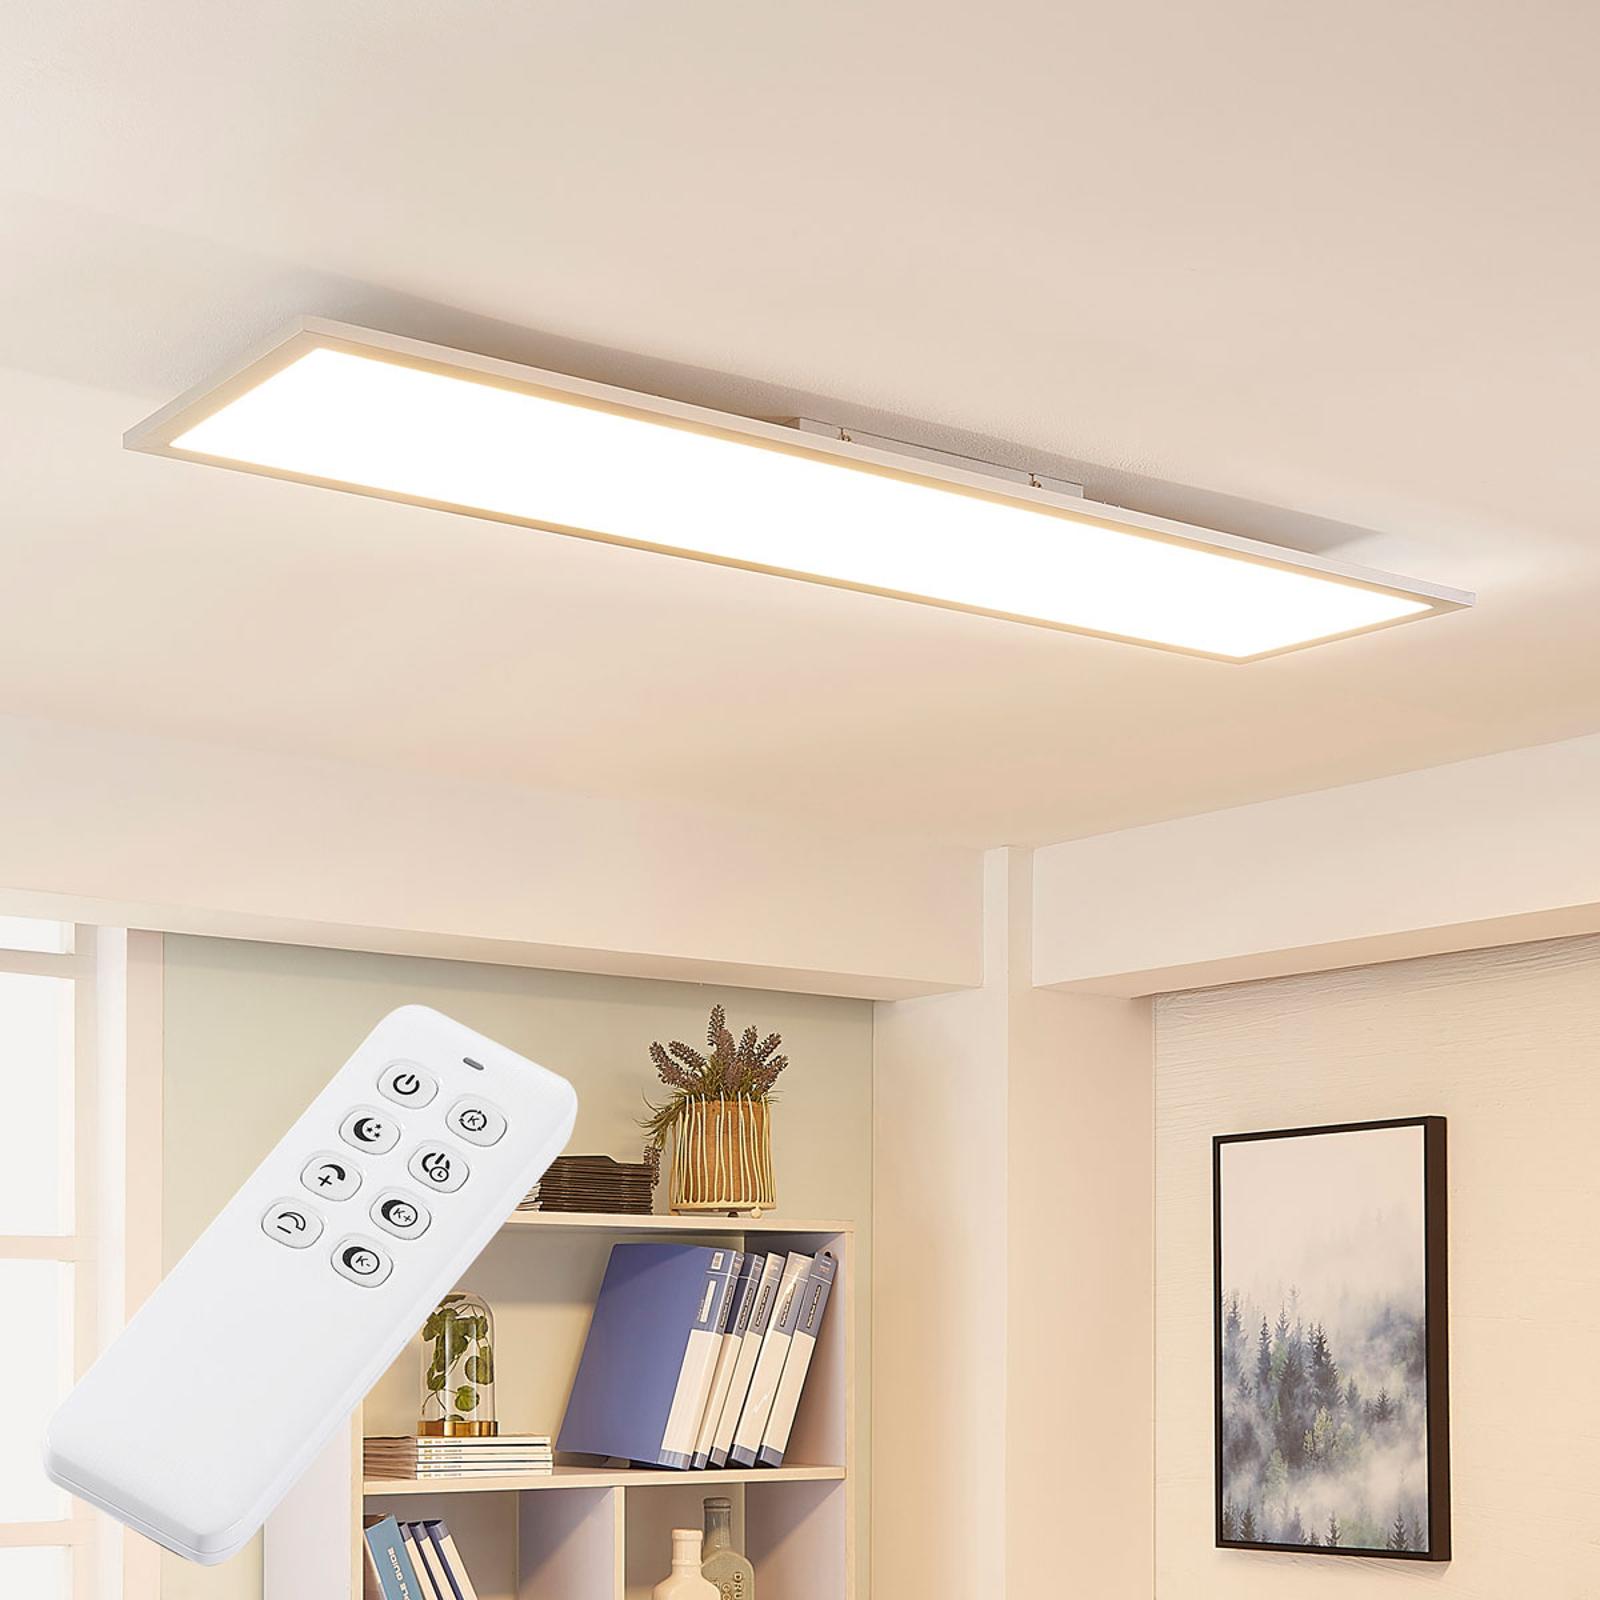 LED plafondlamp Lysander, lichtkleur verstelbaar